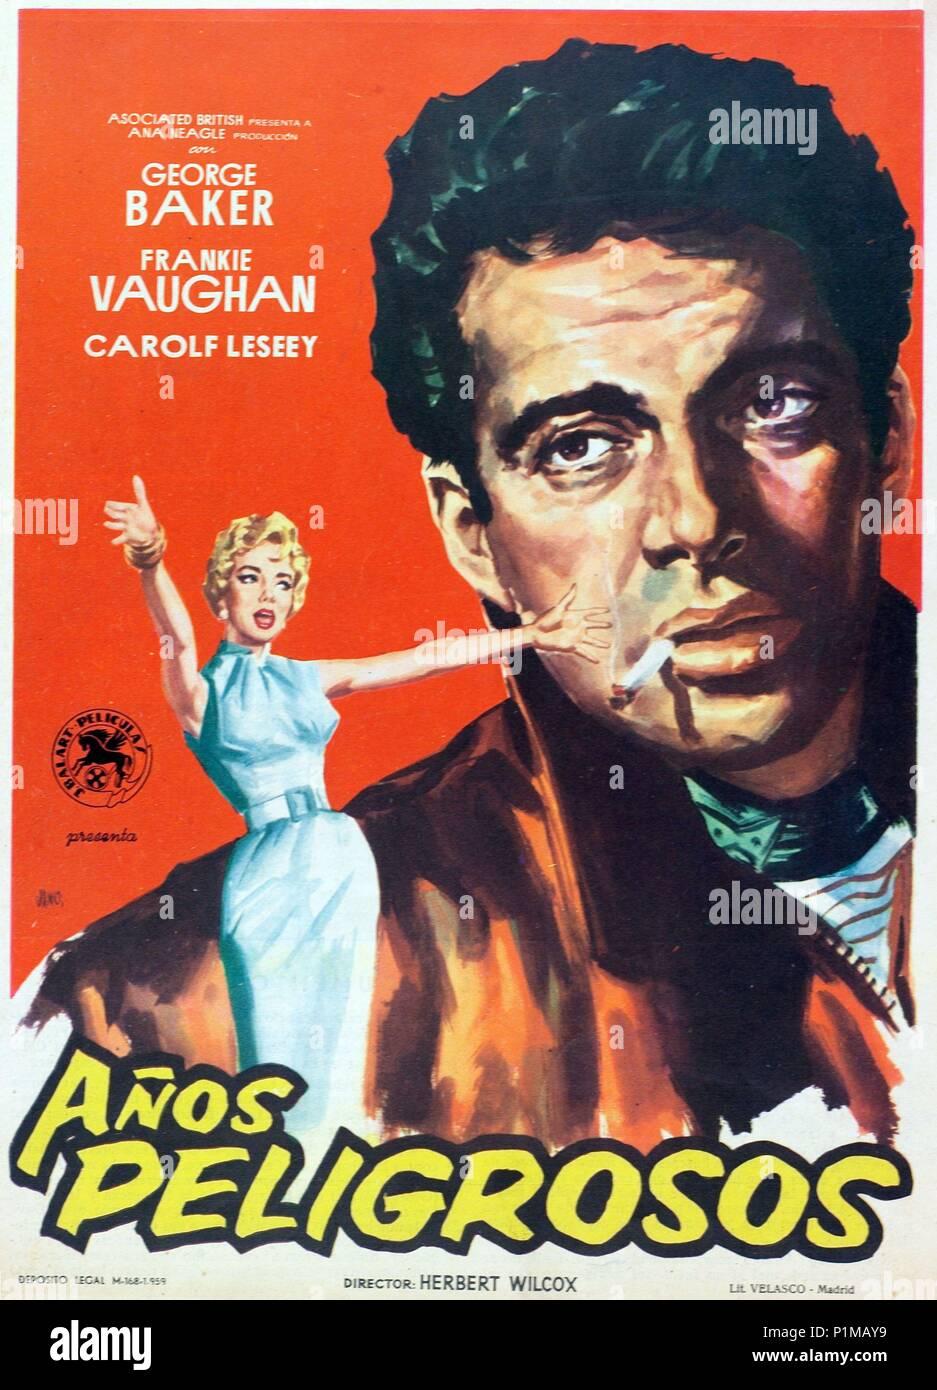 Original Film Title: THESE DANGEROUS YEARS.  English Title: DANGEROUS YOUTH.  Film Director: HERBERT WILCOX.  Year: 1957. Credit: AB-PATHE / Album - Stock Image